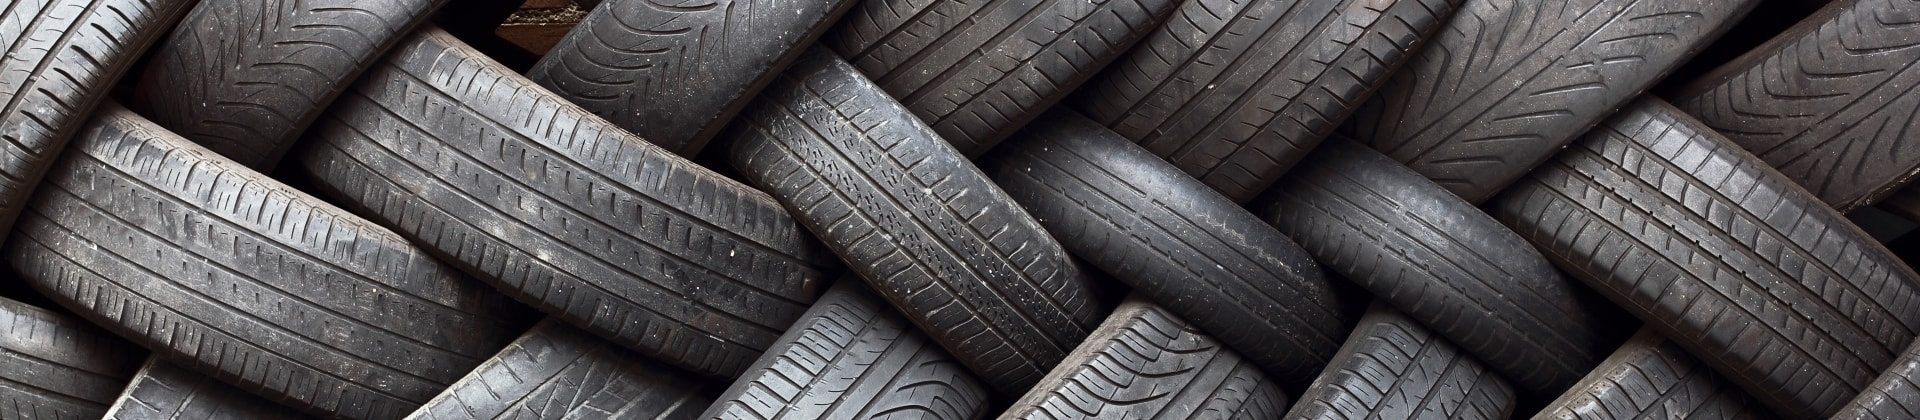 Утилизация шин и покрышек